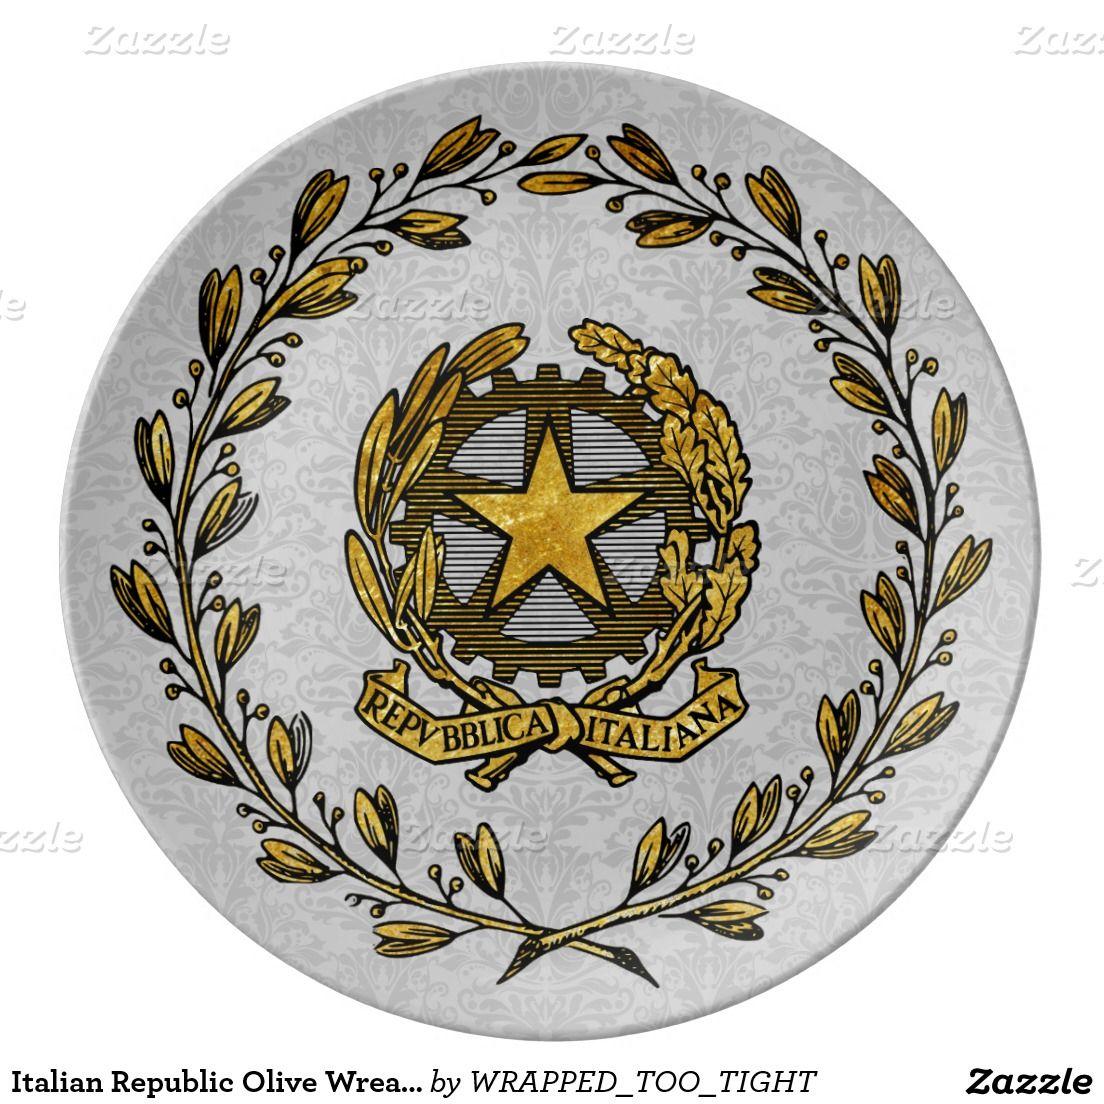 Italian Republic Olive Wreath Gold Personalize Porcelain Plate  sc 1 st  Pinterest & Italian Republic Olive Wreath Gold Personalize Porcelain Plate ...